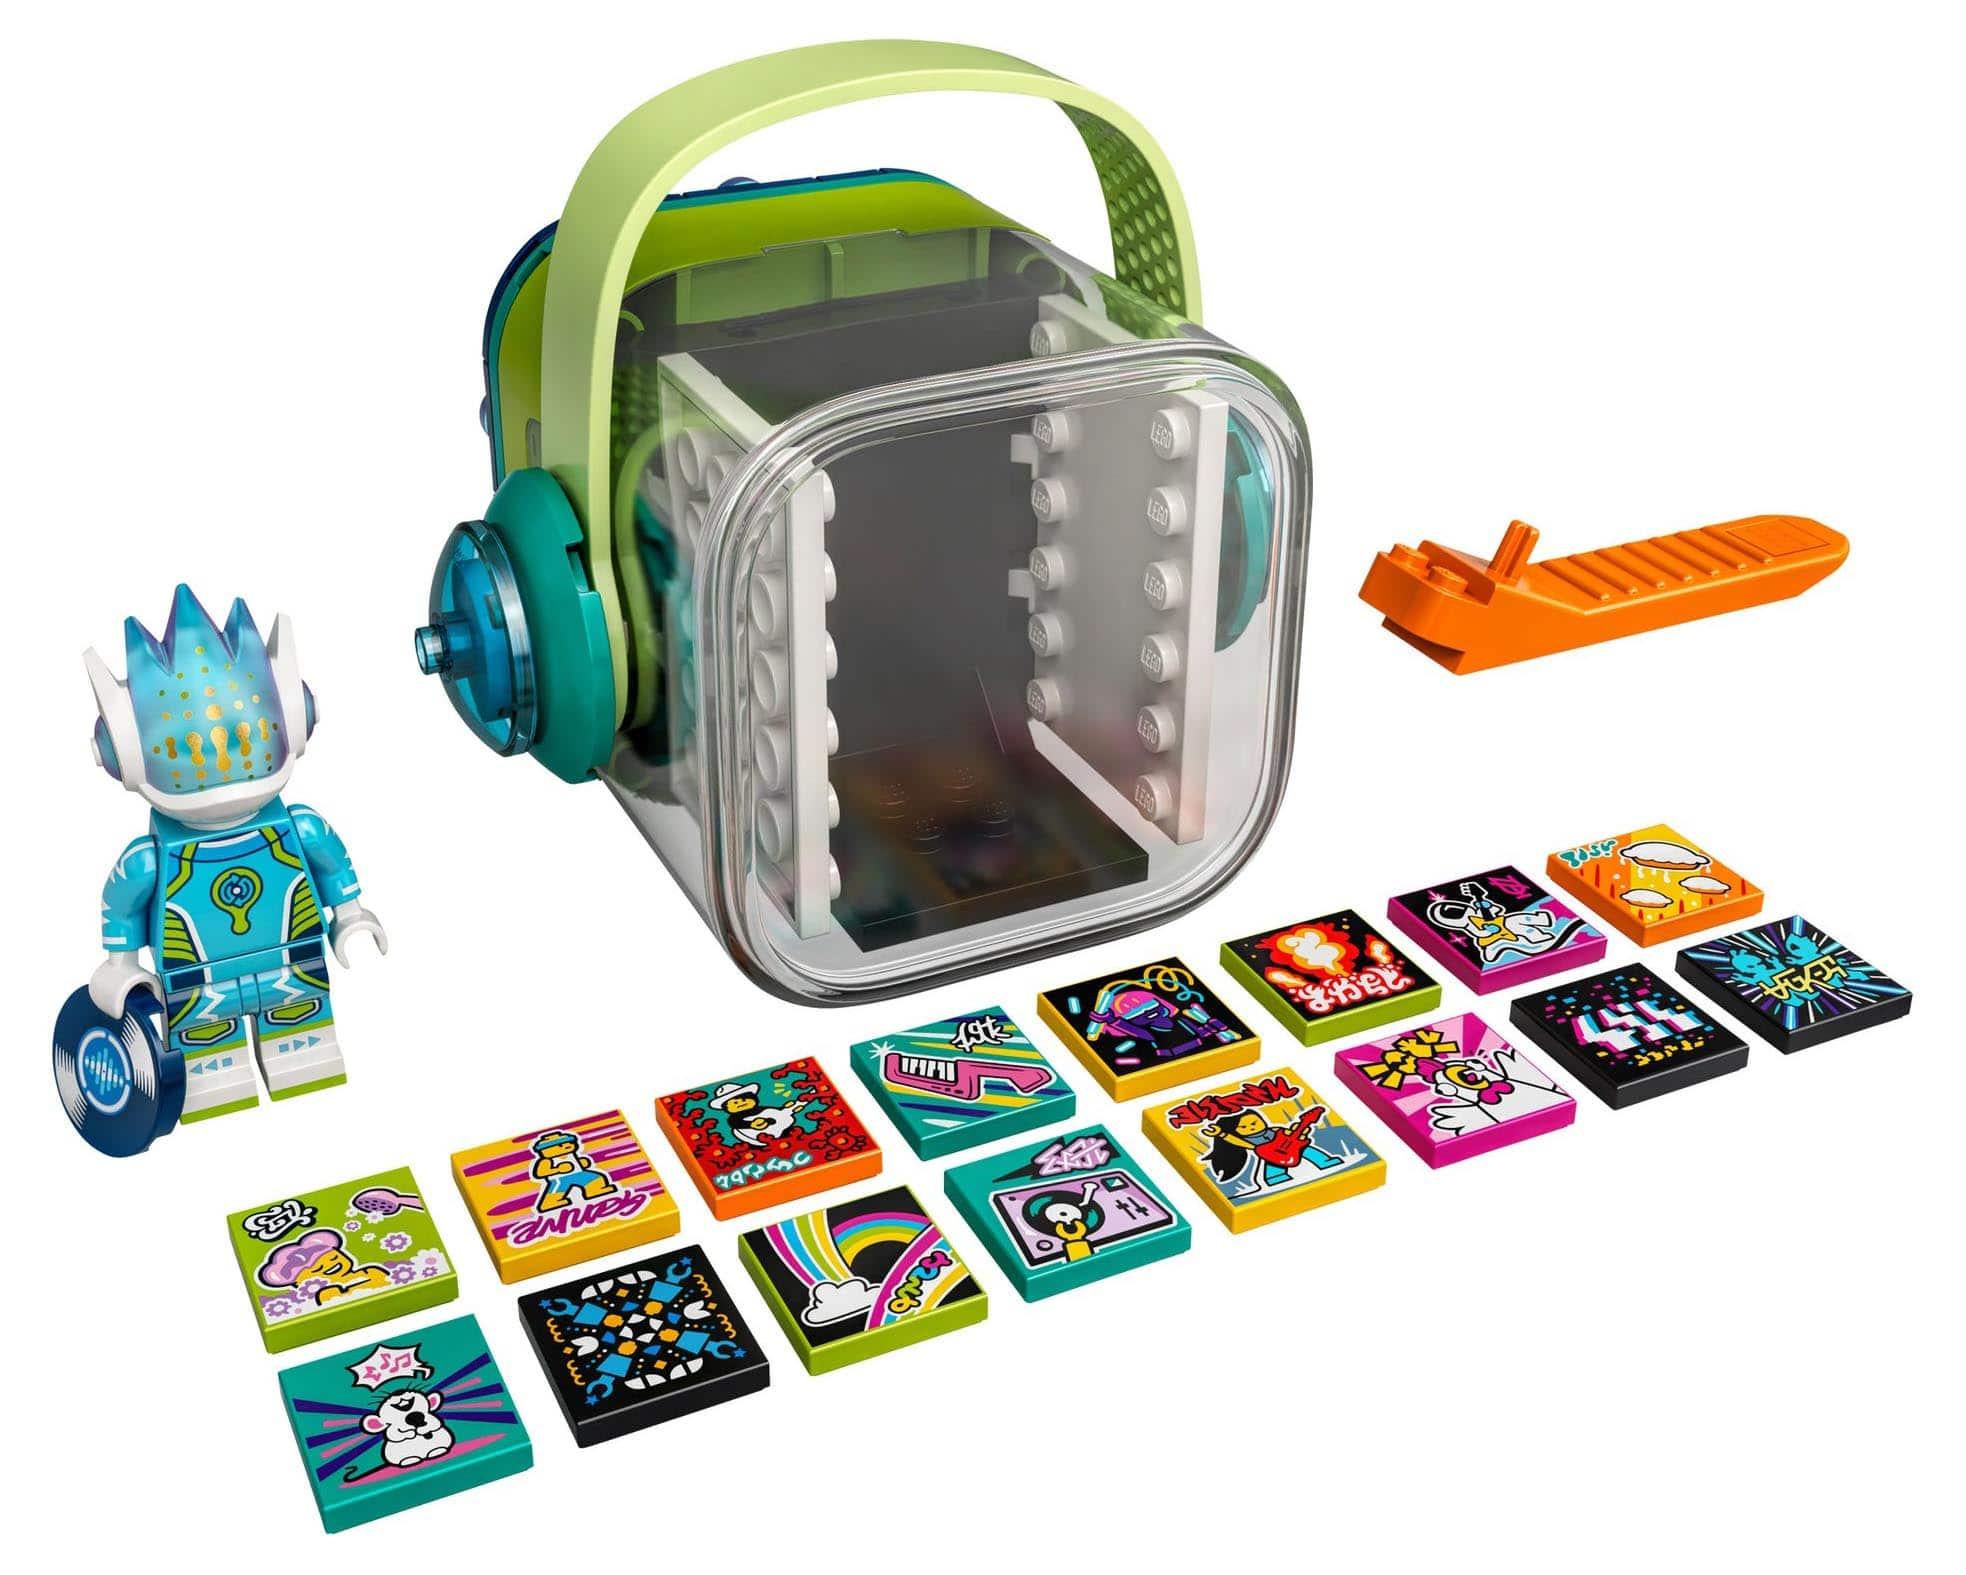 LEGO Vidiyo 43104 Alien Dj Beatbox (1)